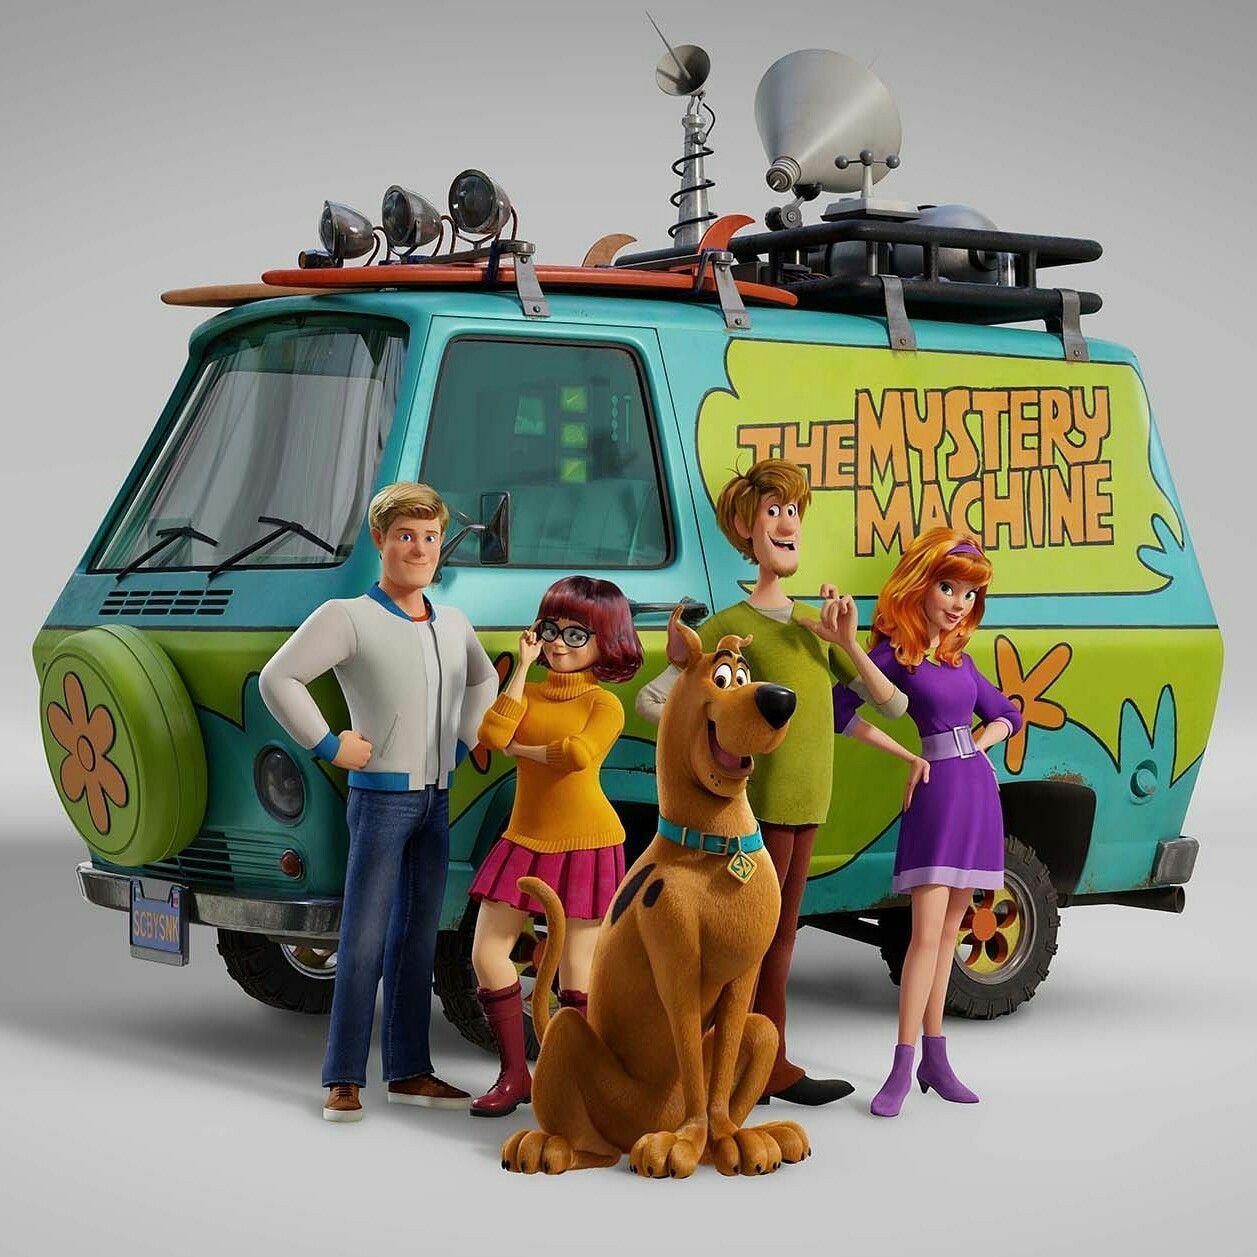 Zoinks Mysteryinc From Scoob Looks Groovy Scoobydoo Shaggyrogers Groovy Groovy Mysteryinc Scoob Scoobydoo Shaggyrogers In 2020 Scooby Scooby Snax Scooby Doo